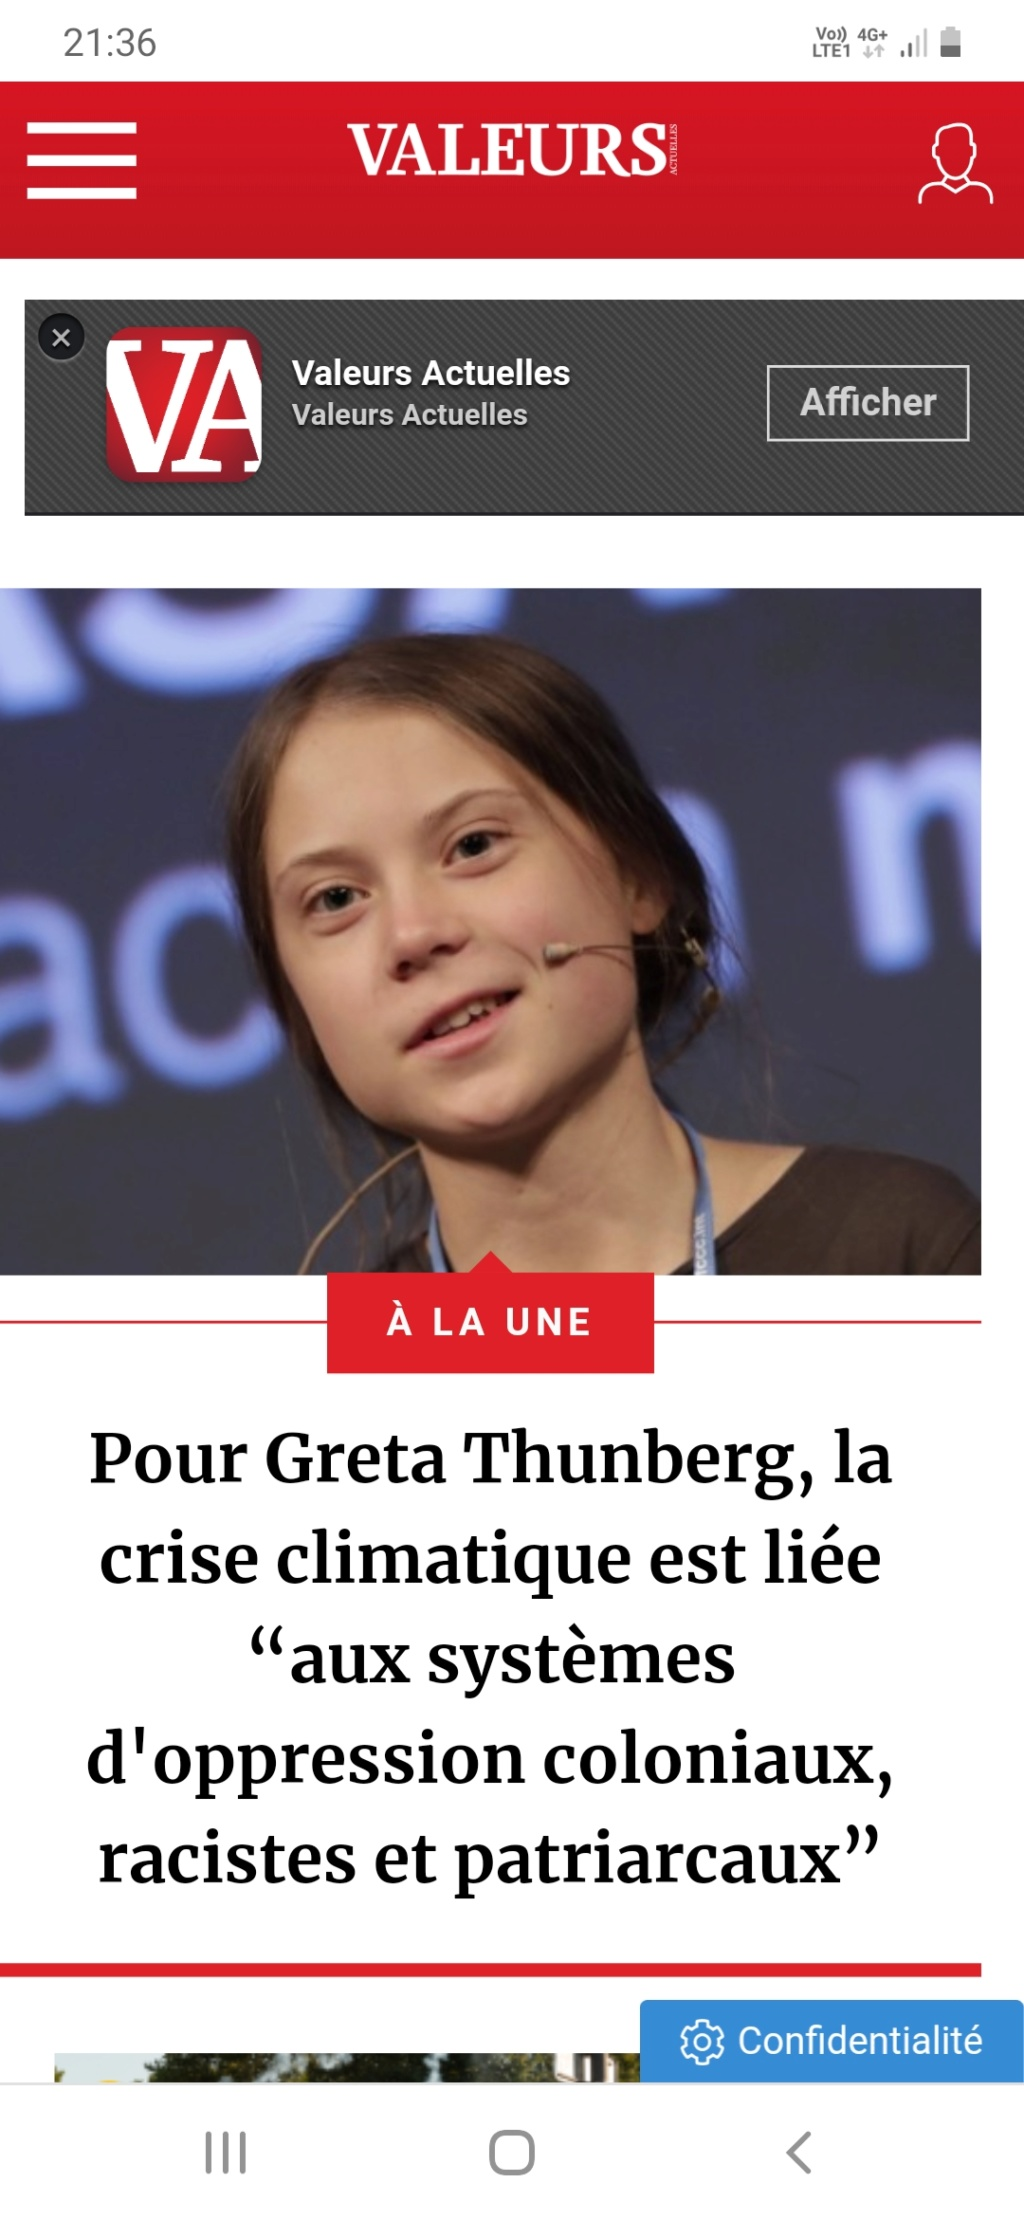 Greta Thunberg pourquoi tant de haine ? - Page 2 Screen35